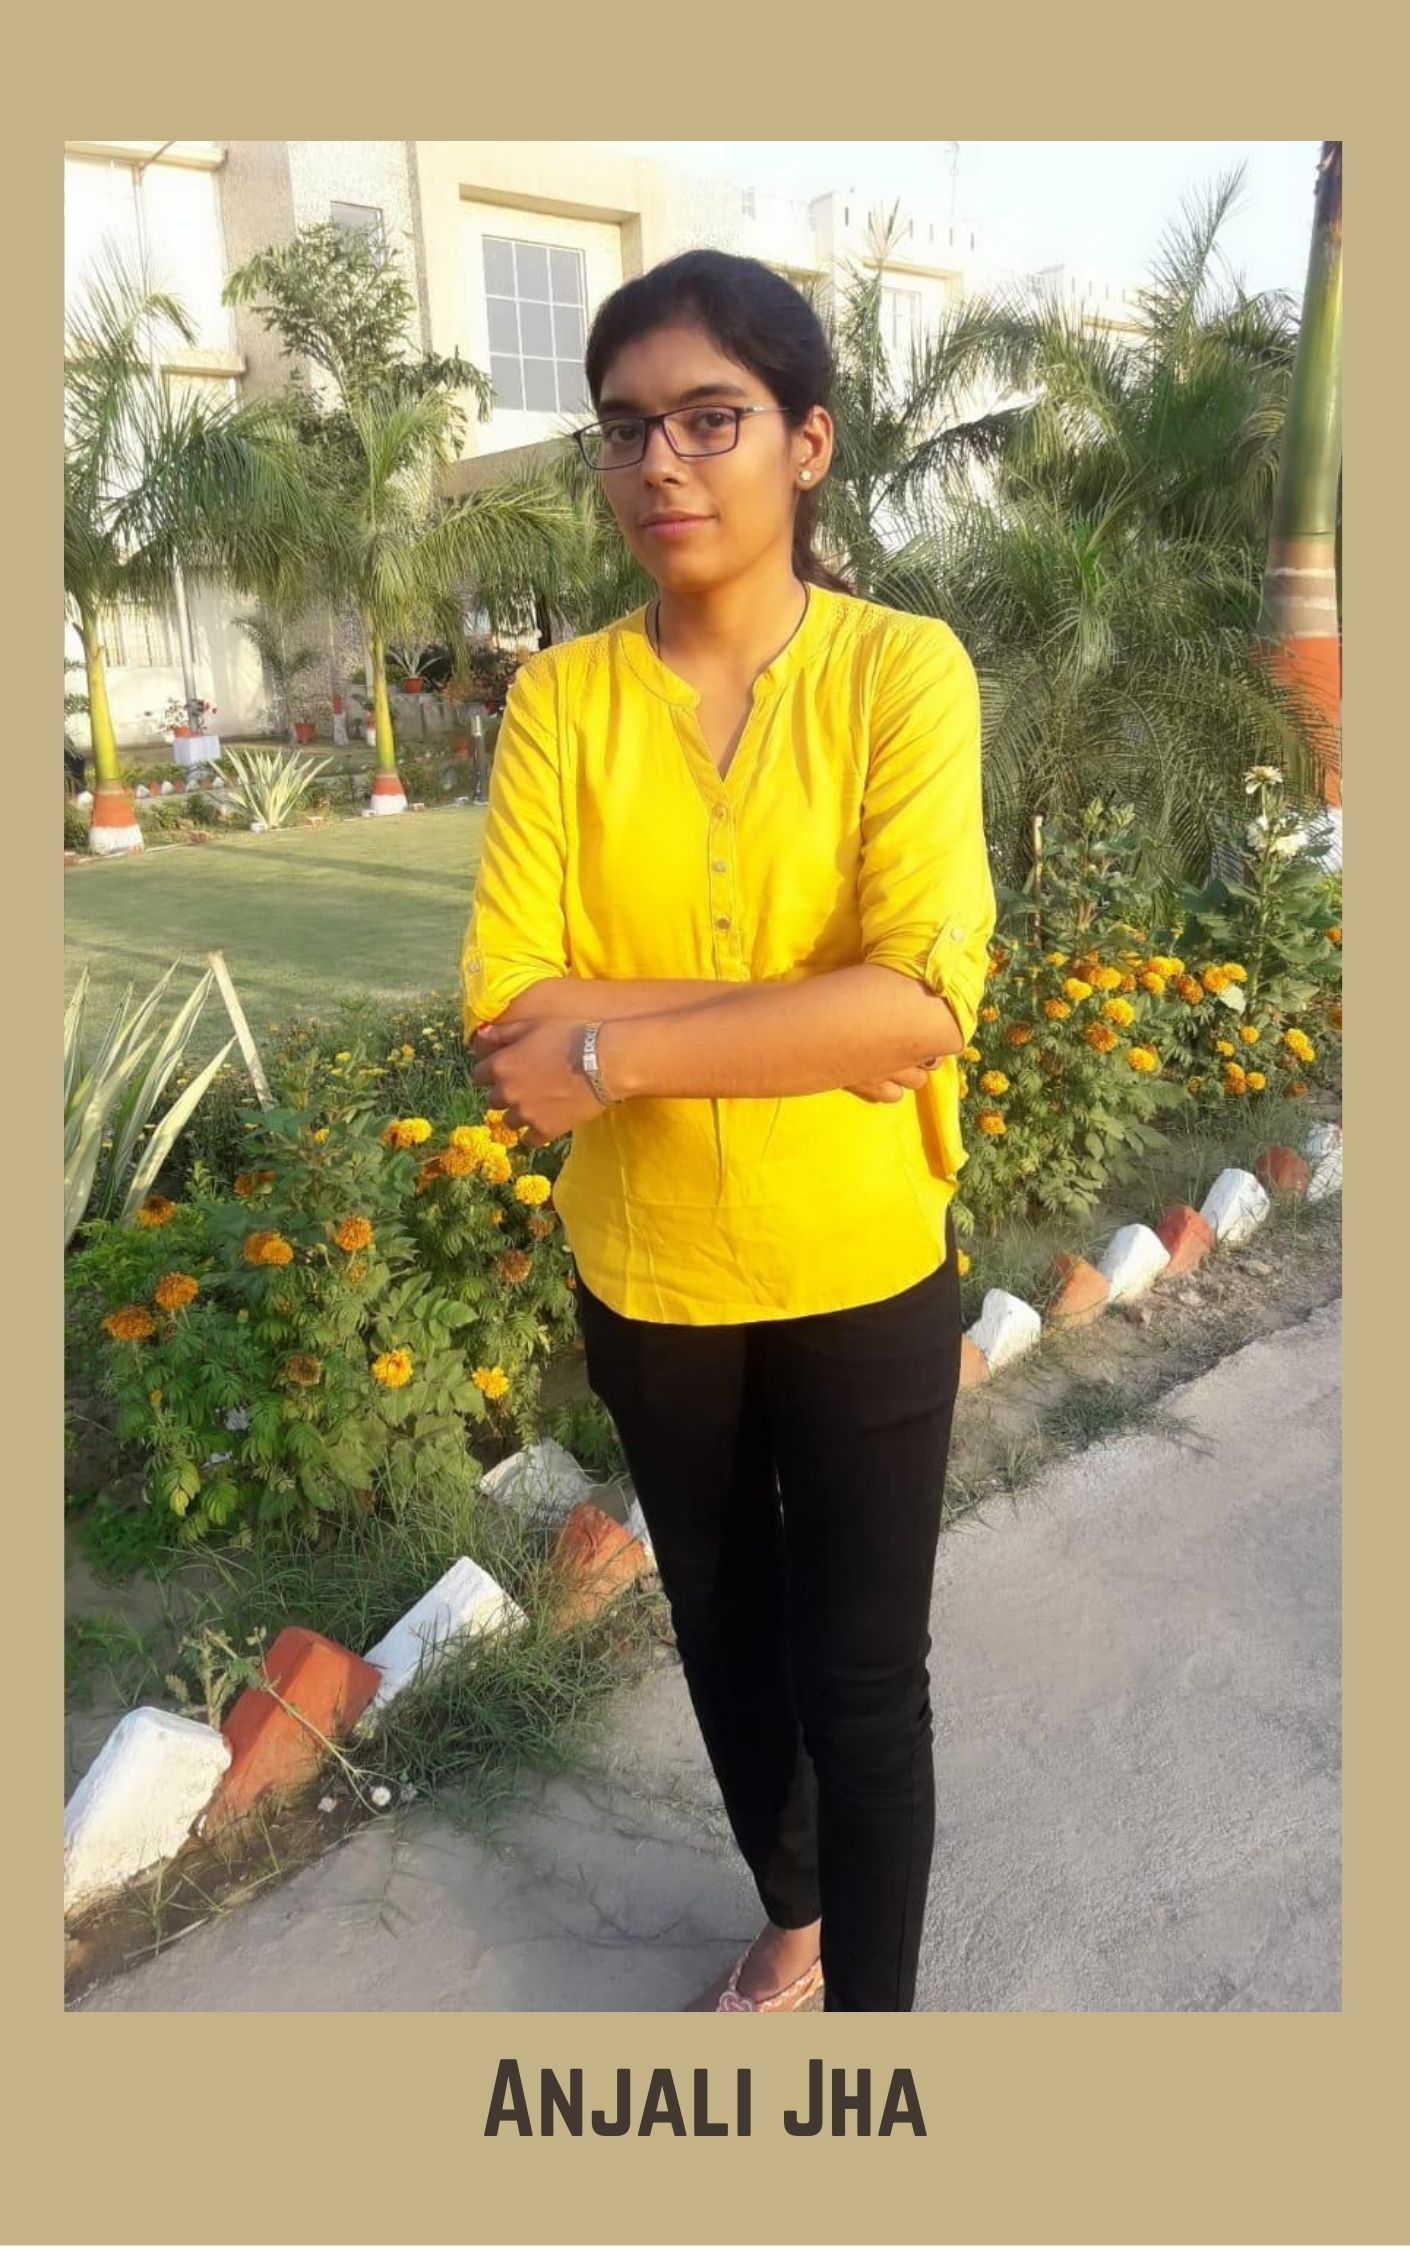 Anjali Jha